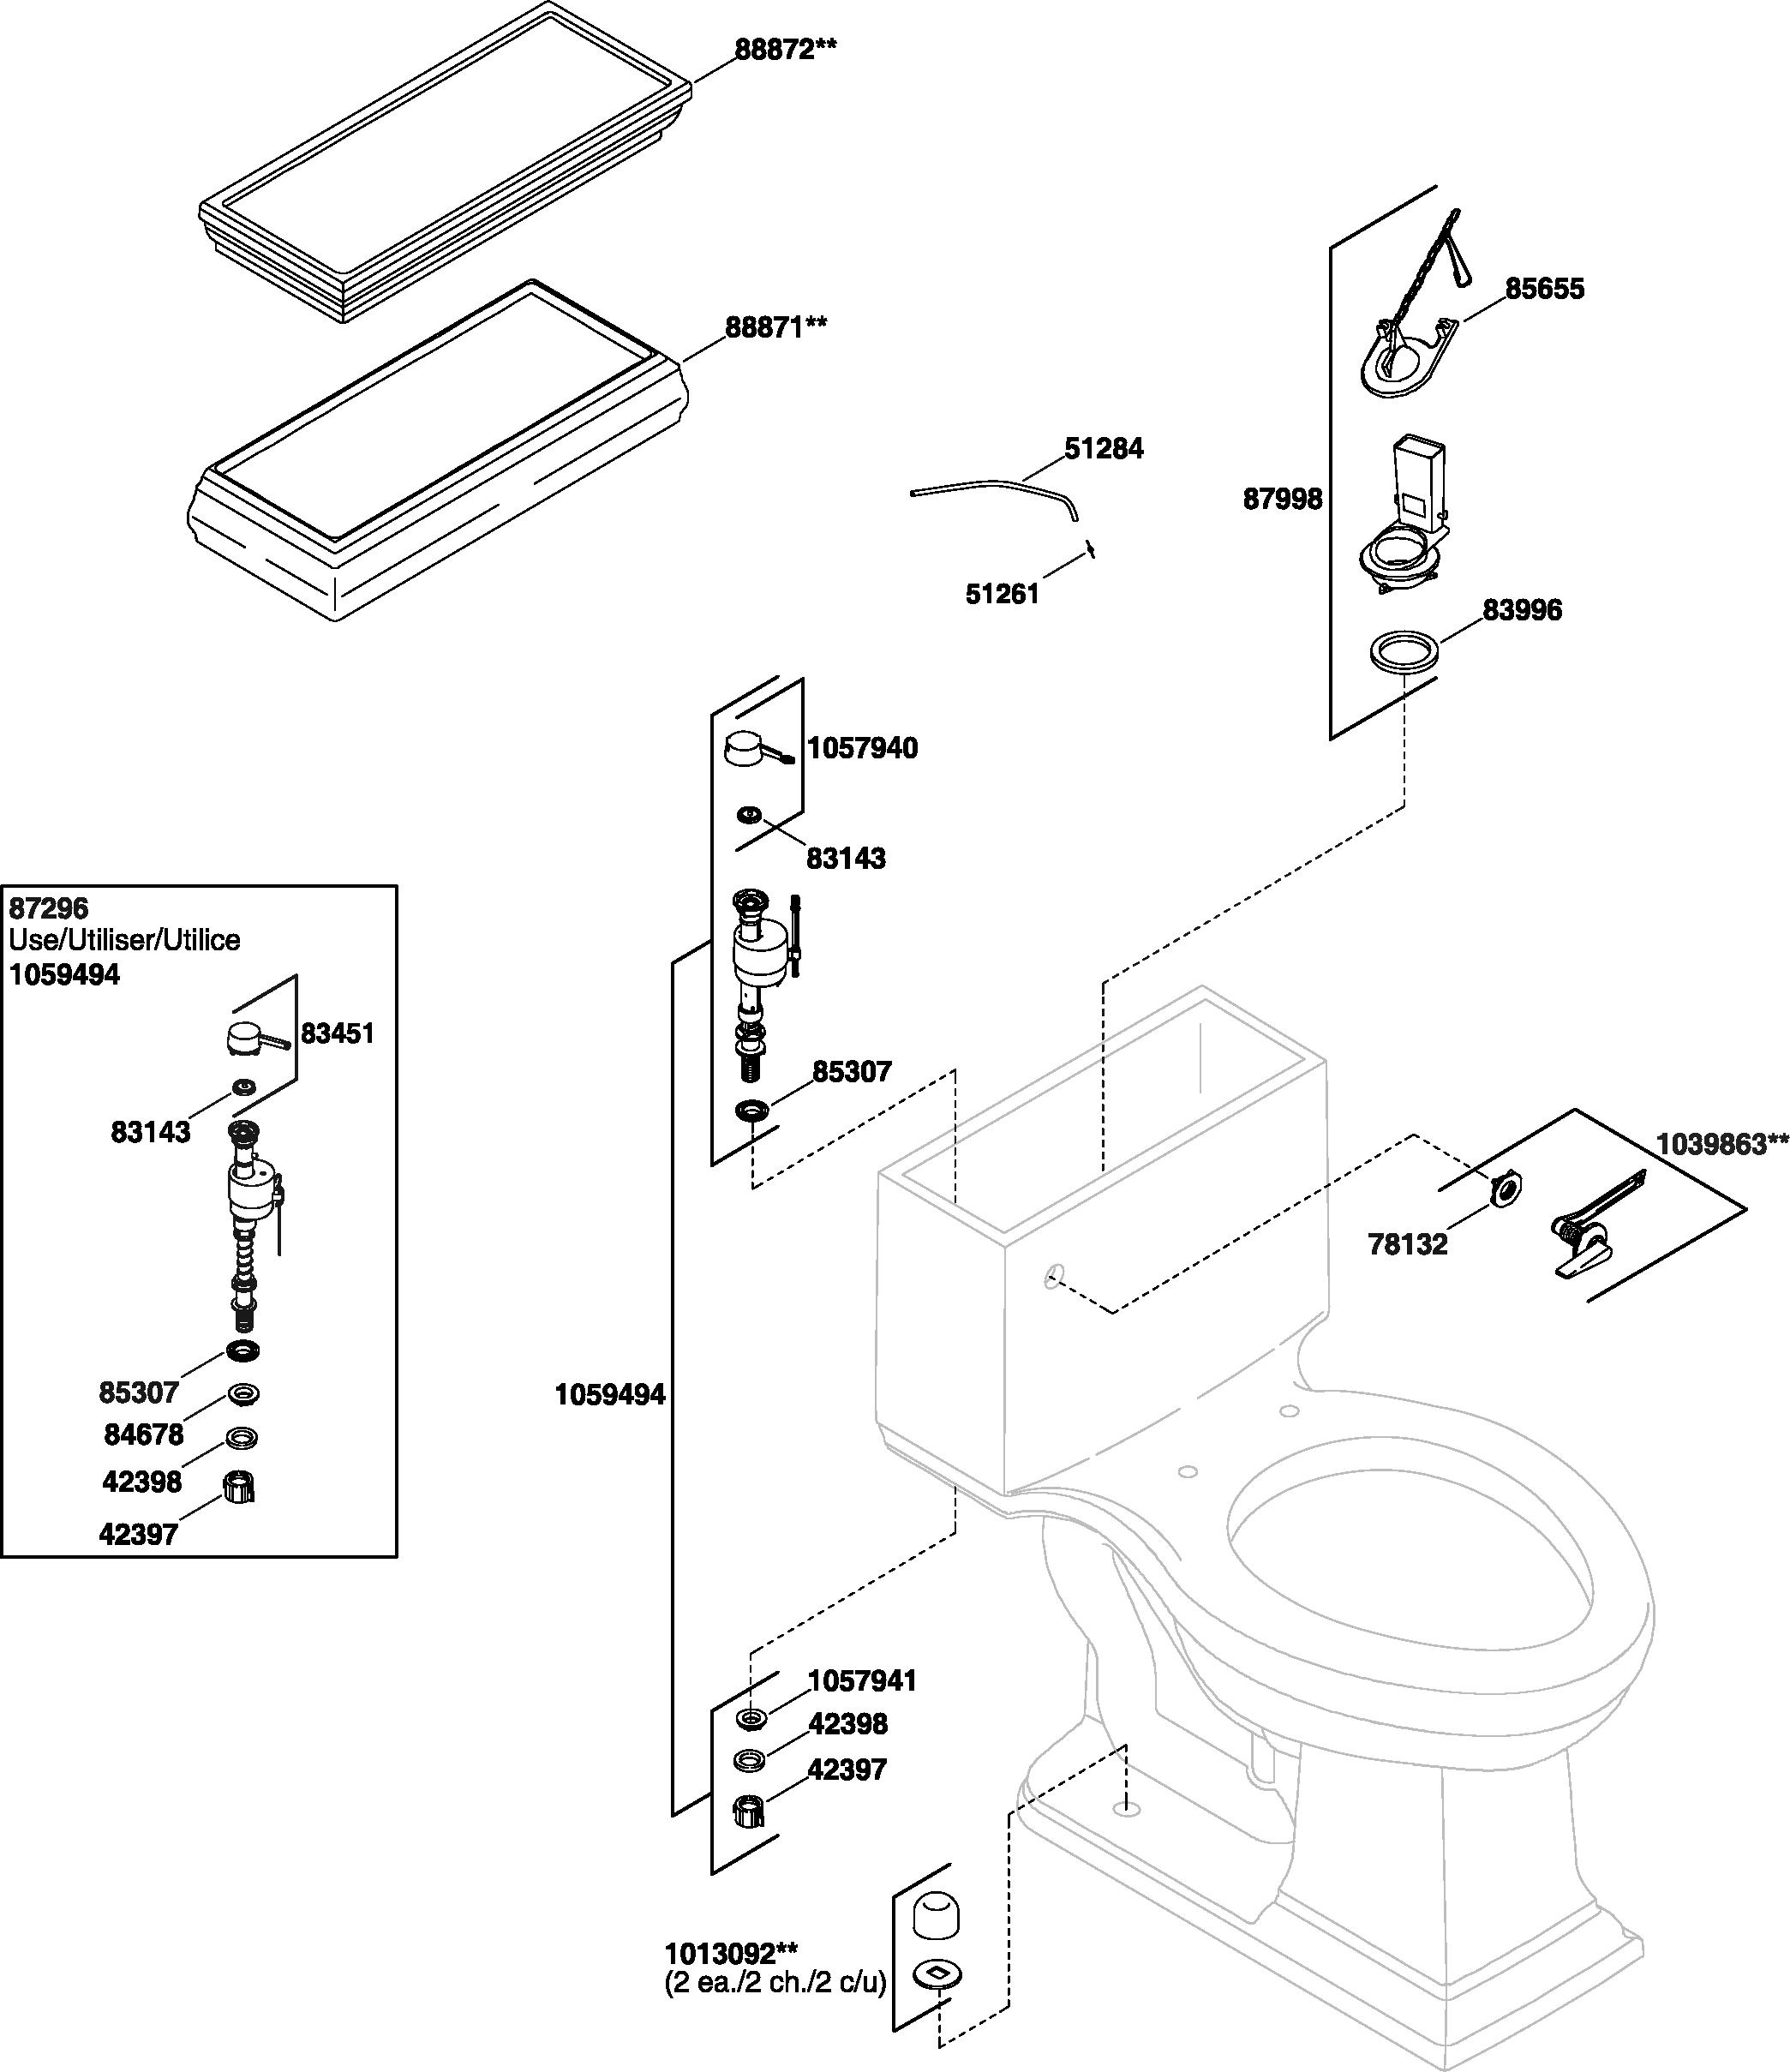 Kohler K 3451 Memoirs Toilet Parts